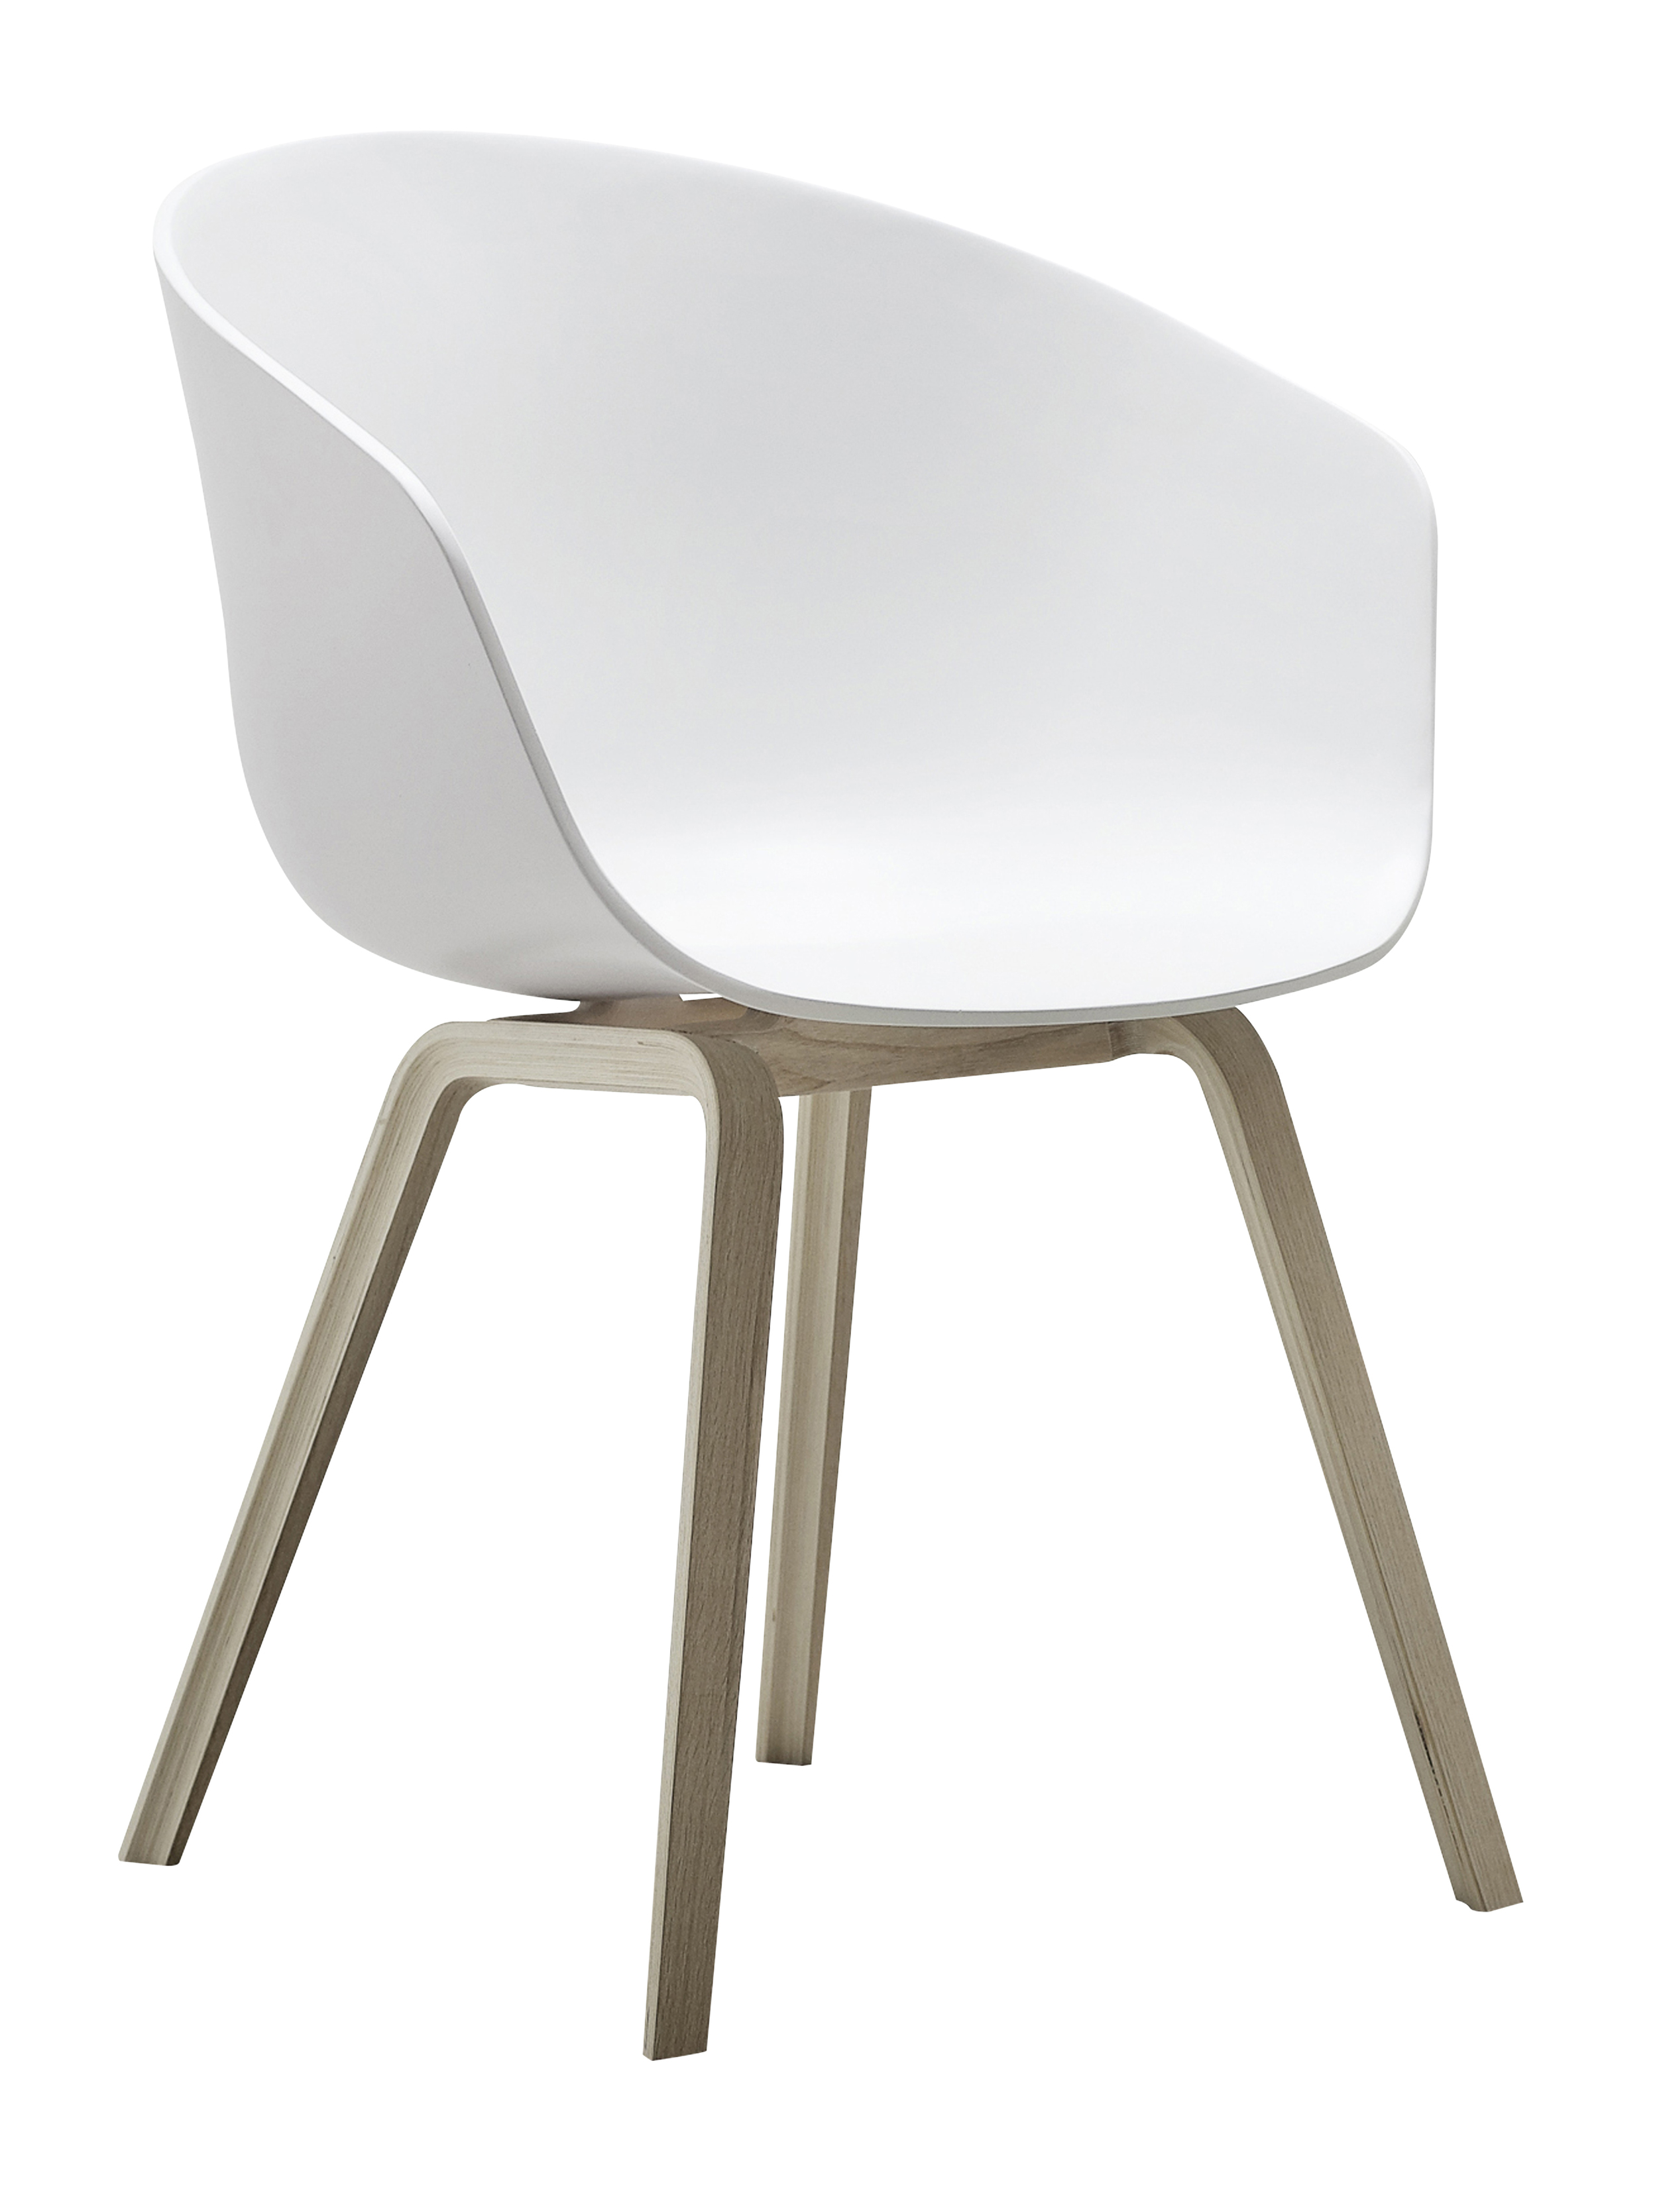 AAC22 Oak Soaped Base white HAY About a chair design stoel Loncin design meubel zetel Leuven Brussels mechelen antwerpen vlaams-branbant Limburg Hasselt Tongeren Genk Sint-Truiden Zoutleeuw.jpg